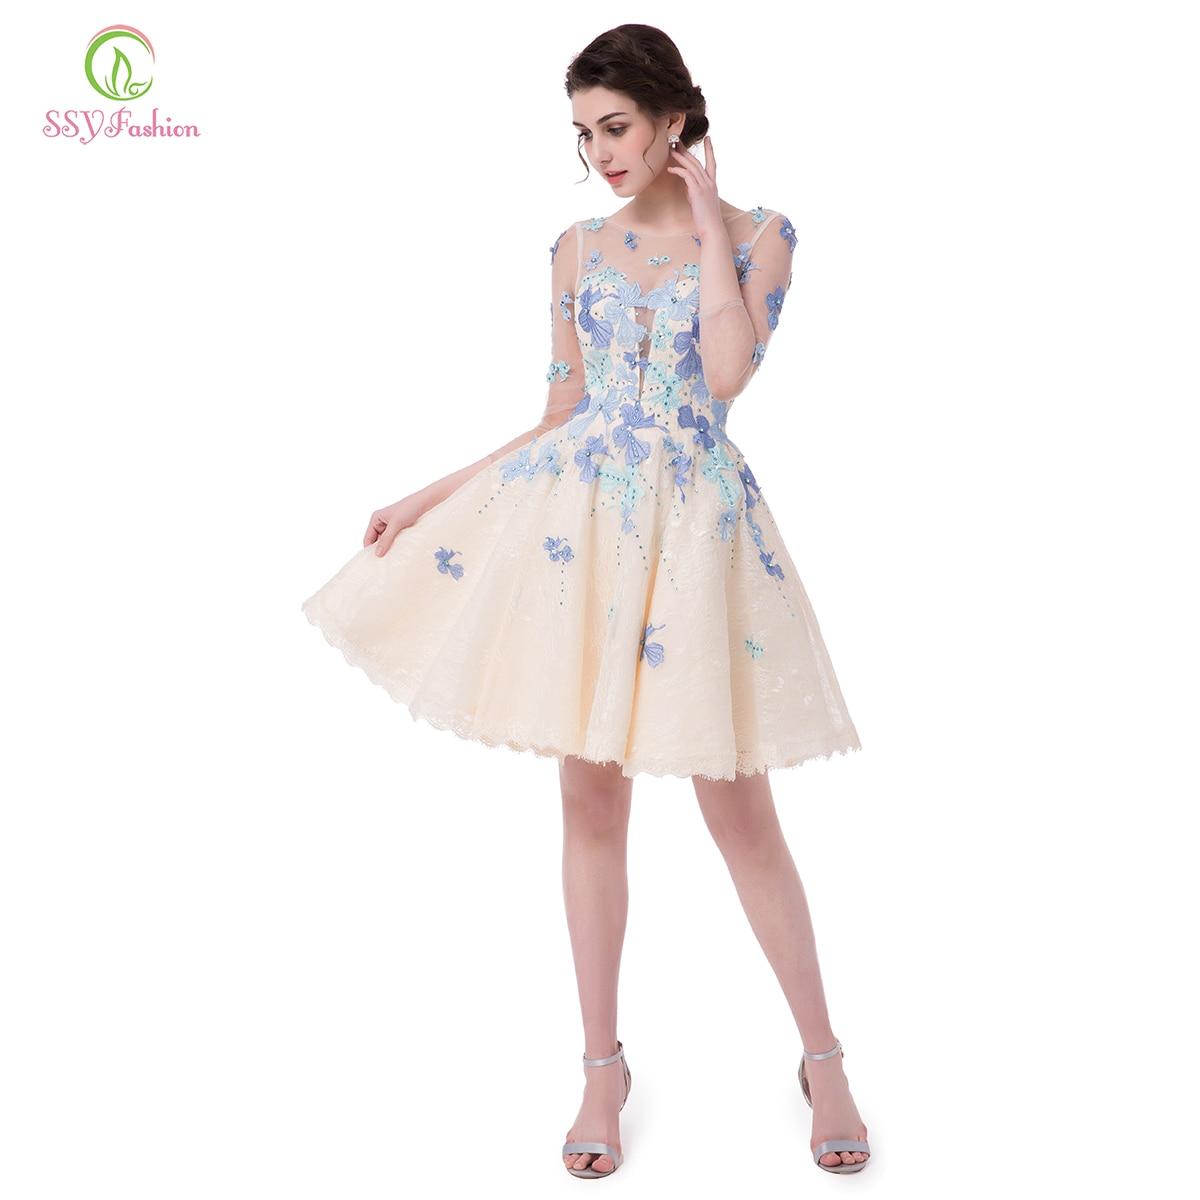 Ssyfashion Long Sleeve Wedding Dresses The Bride Elegant: SSYFashion 2017 New Lace Cocktail Dresses The Bride